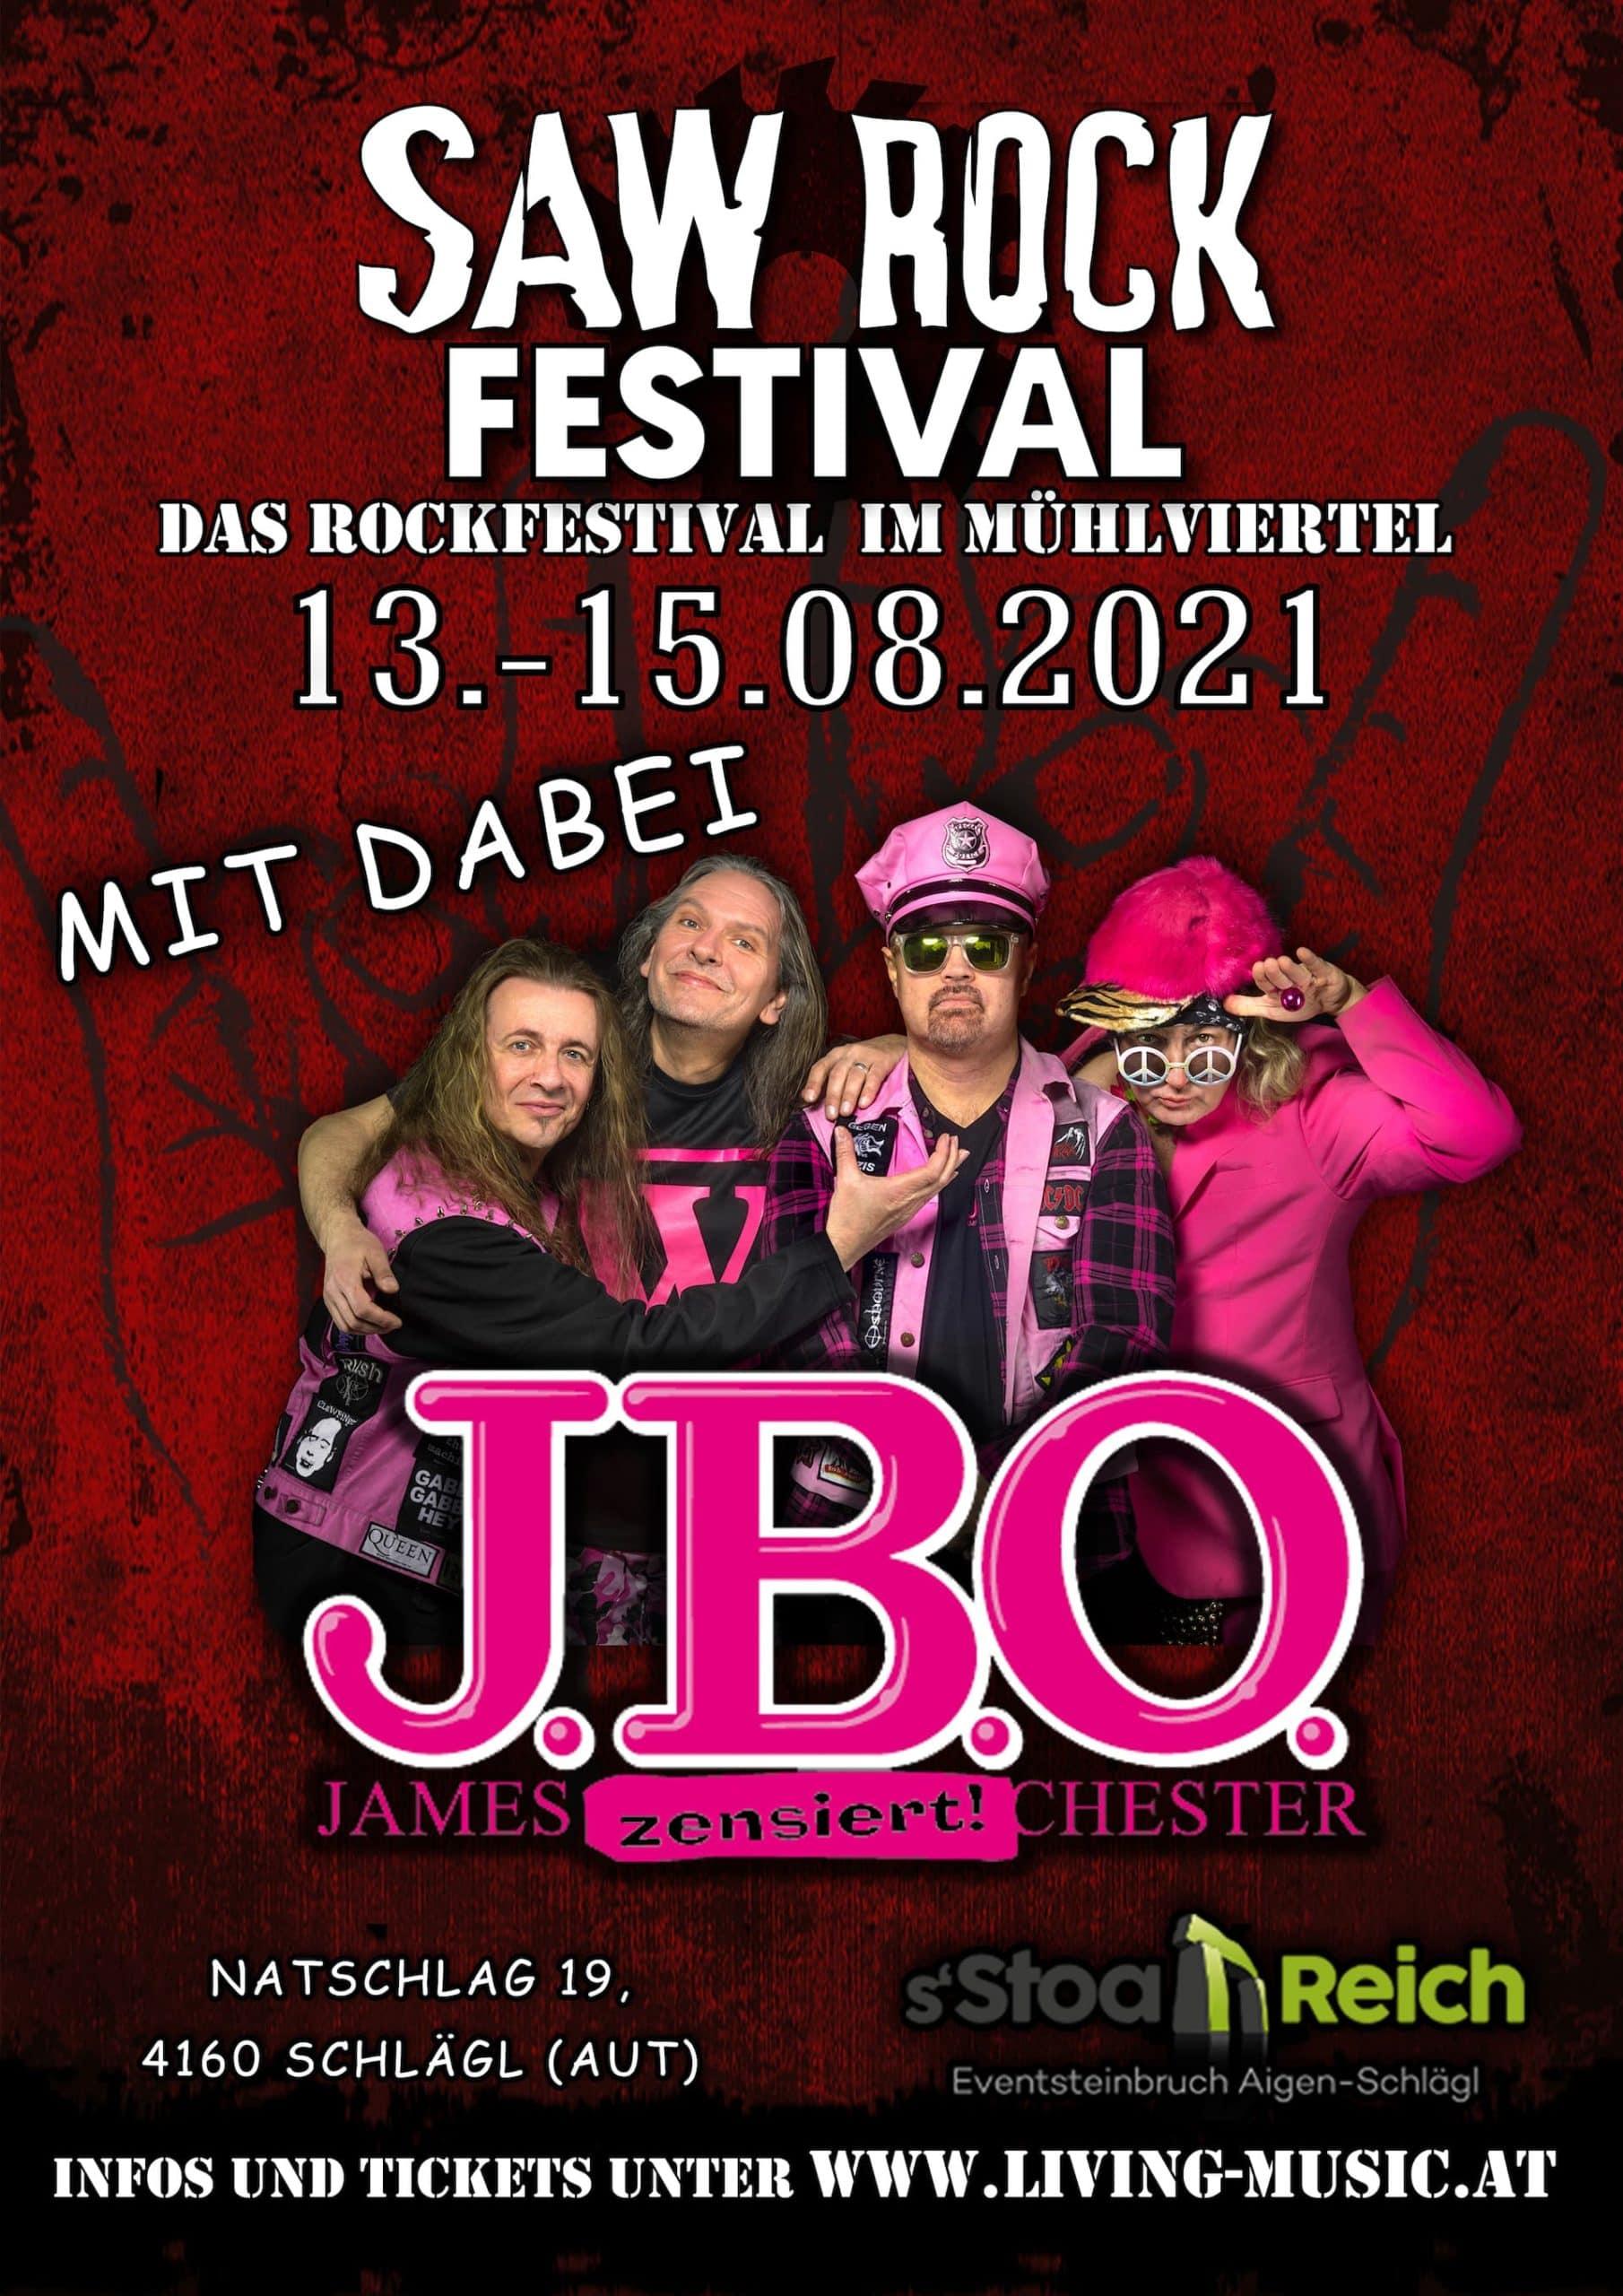 13. August 2021 - SAW Festival, Putzleinsdorf